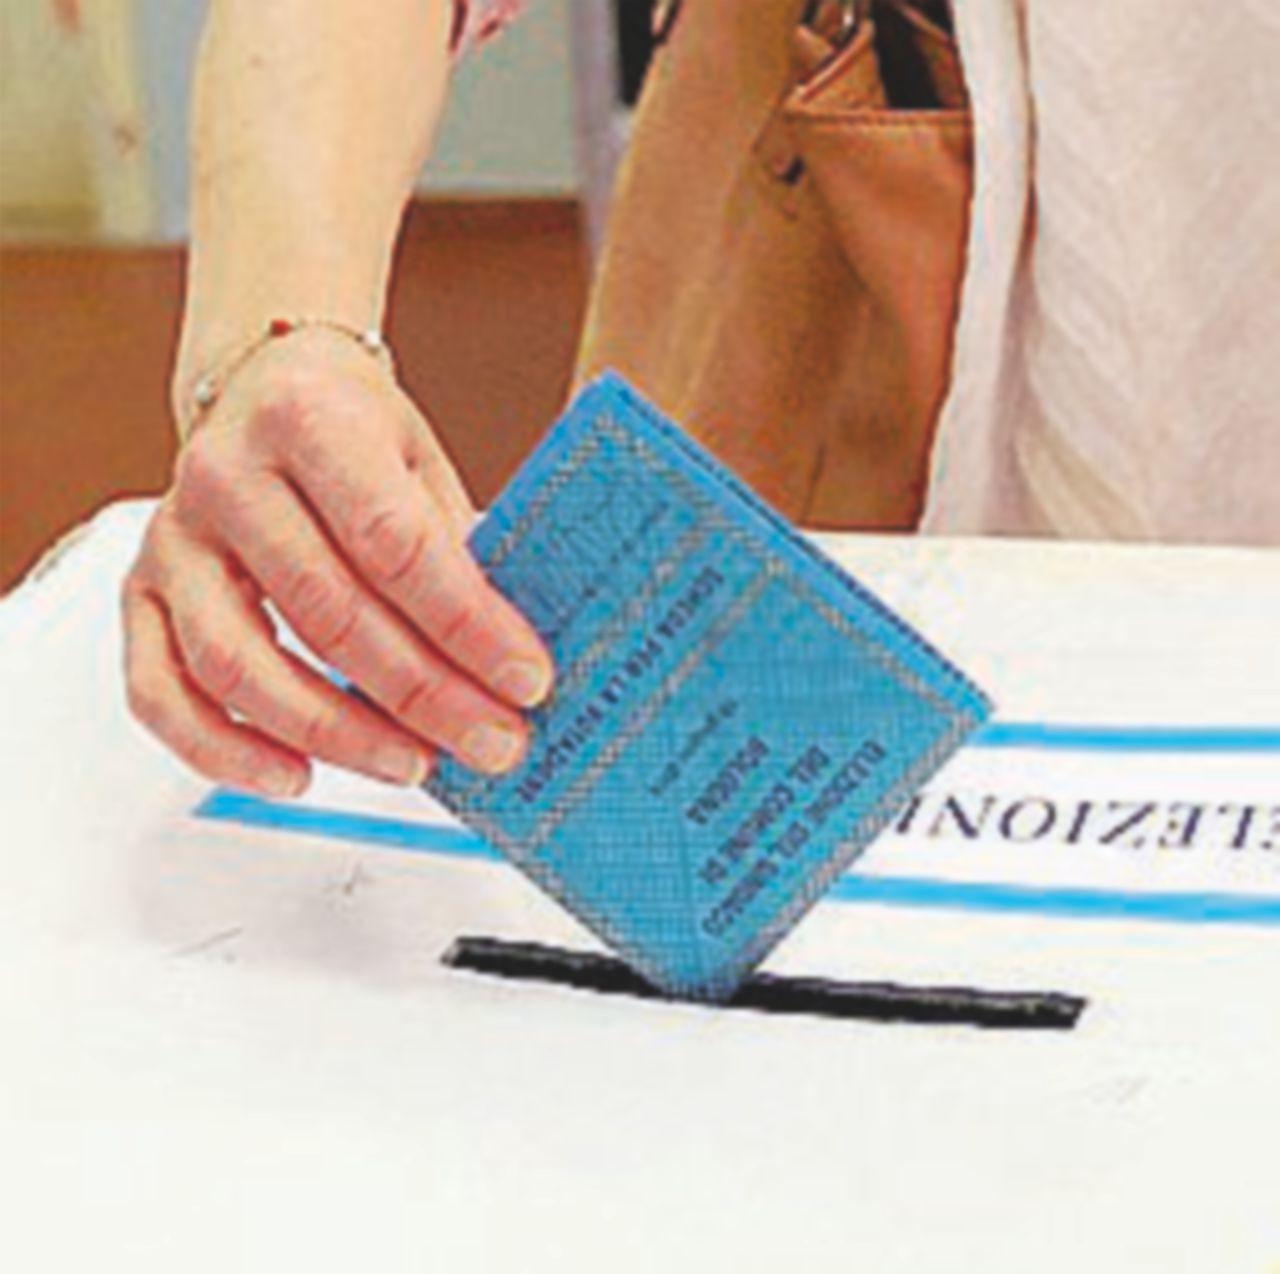 Maria Elena vuol rifare l'Italicum: e la fiducia?